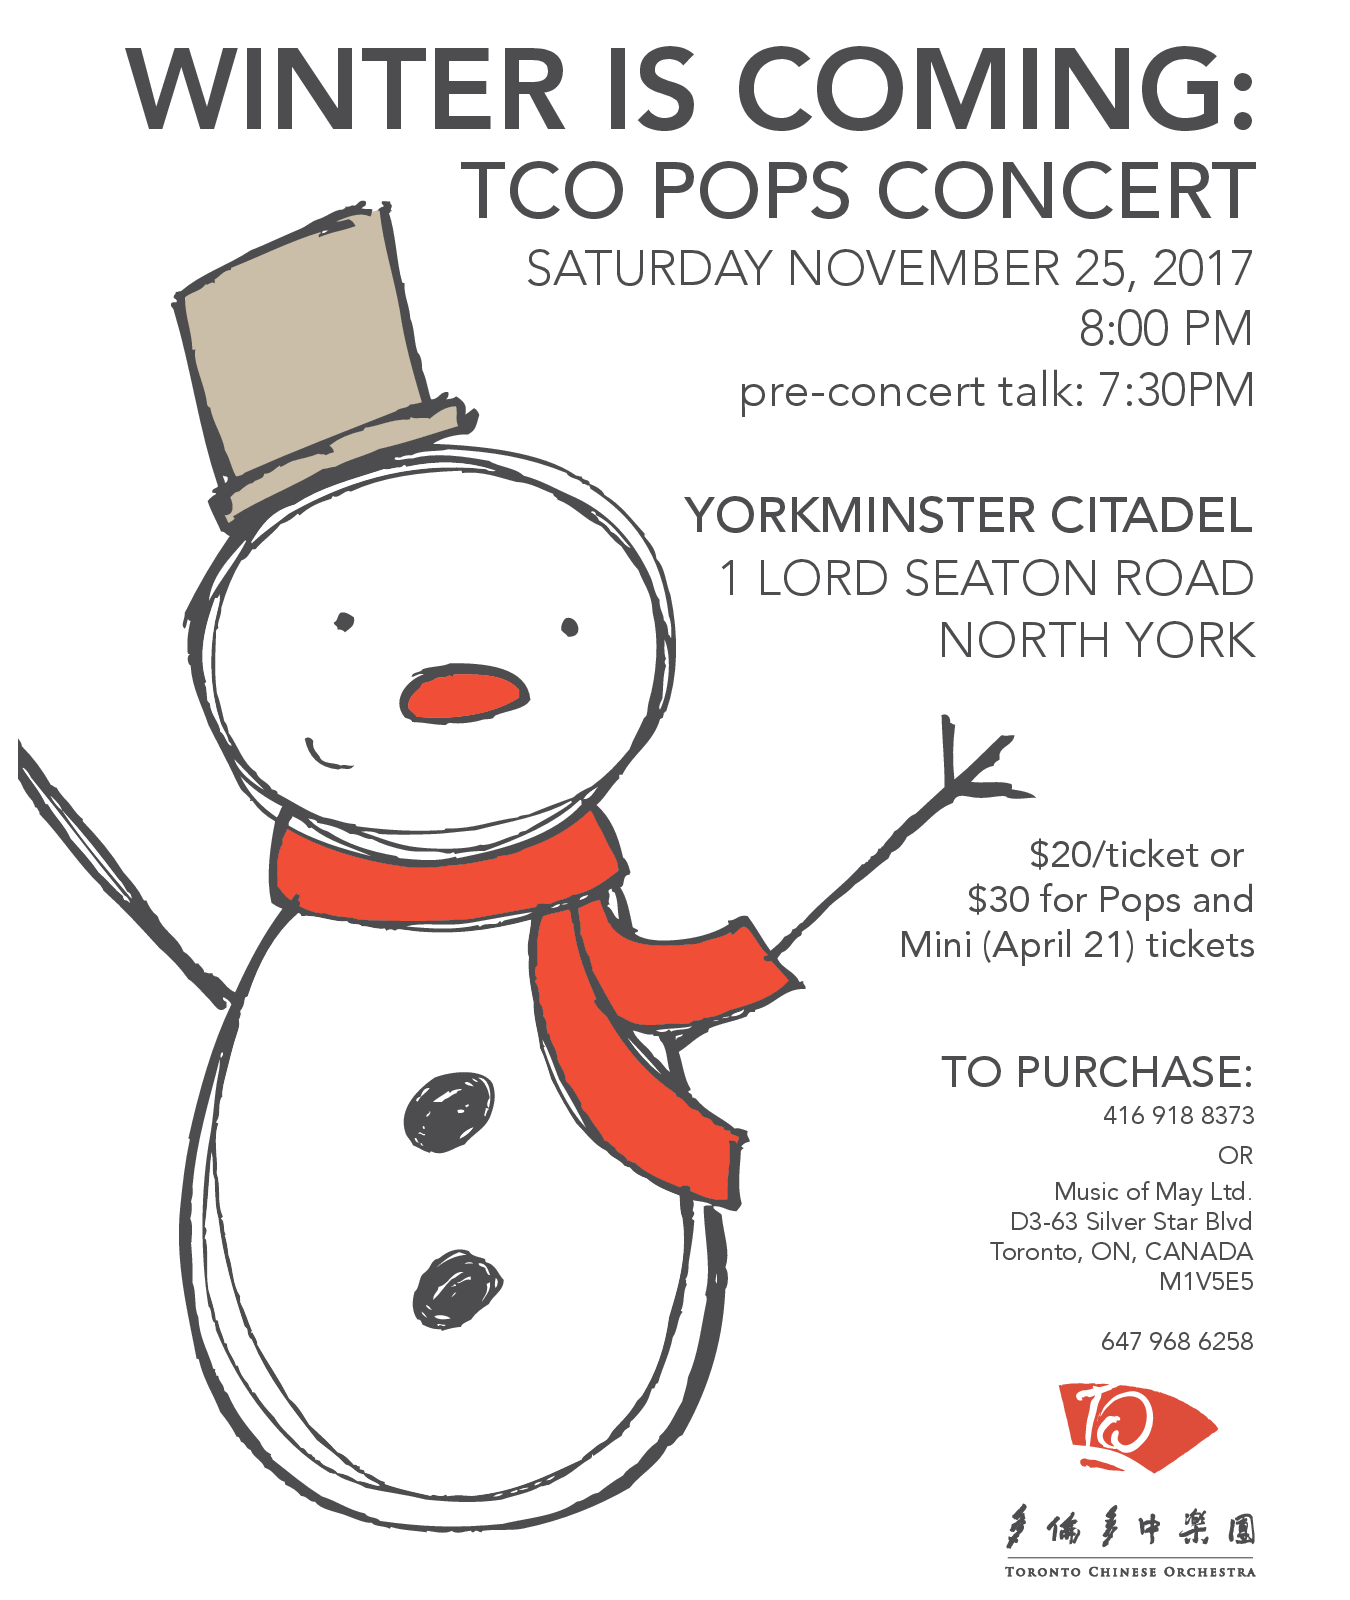 2017-11-25 TCO POPS concert: Winter is Coming